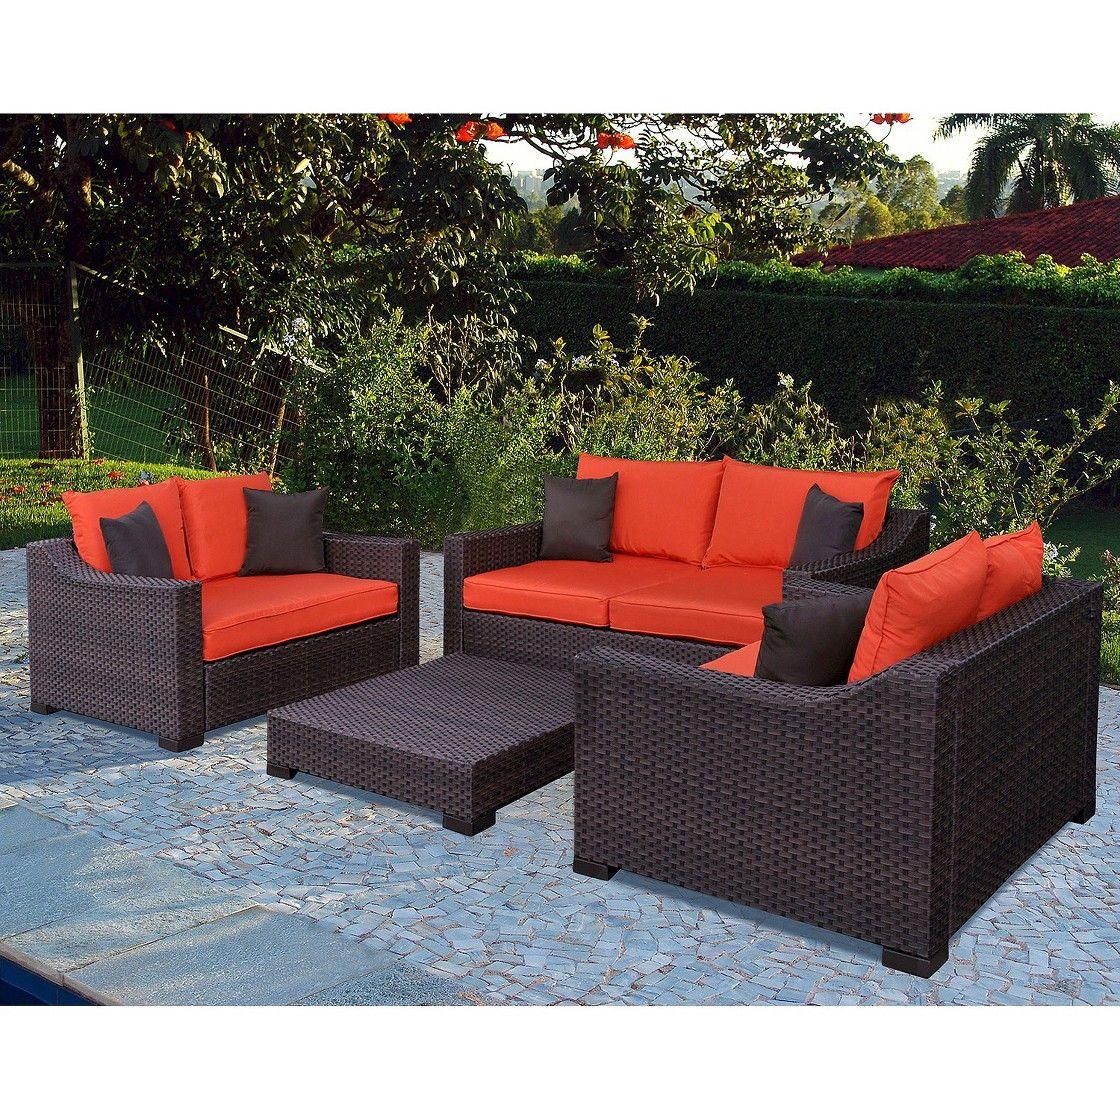 Beautiful Atlantic Furniture New Orleans 4 Piece Wicker Patio Conversation Furniture  Set